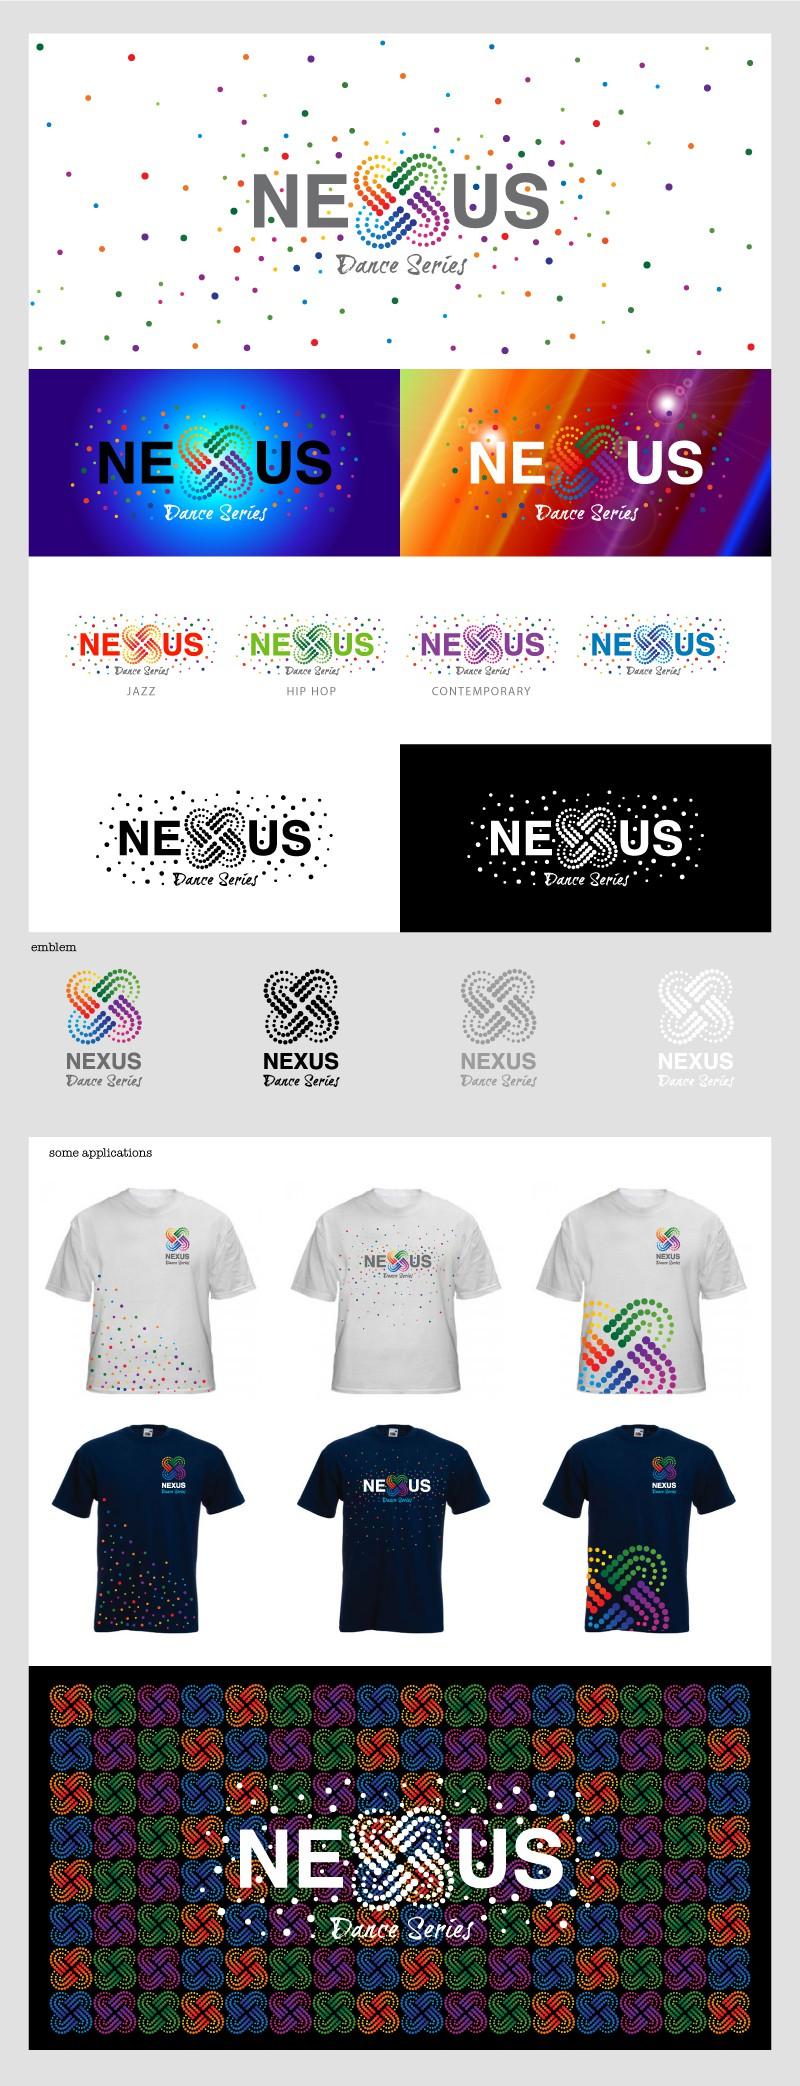 Create the next logo for Nexus Dance Series